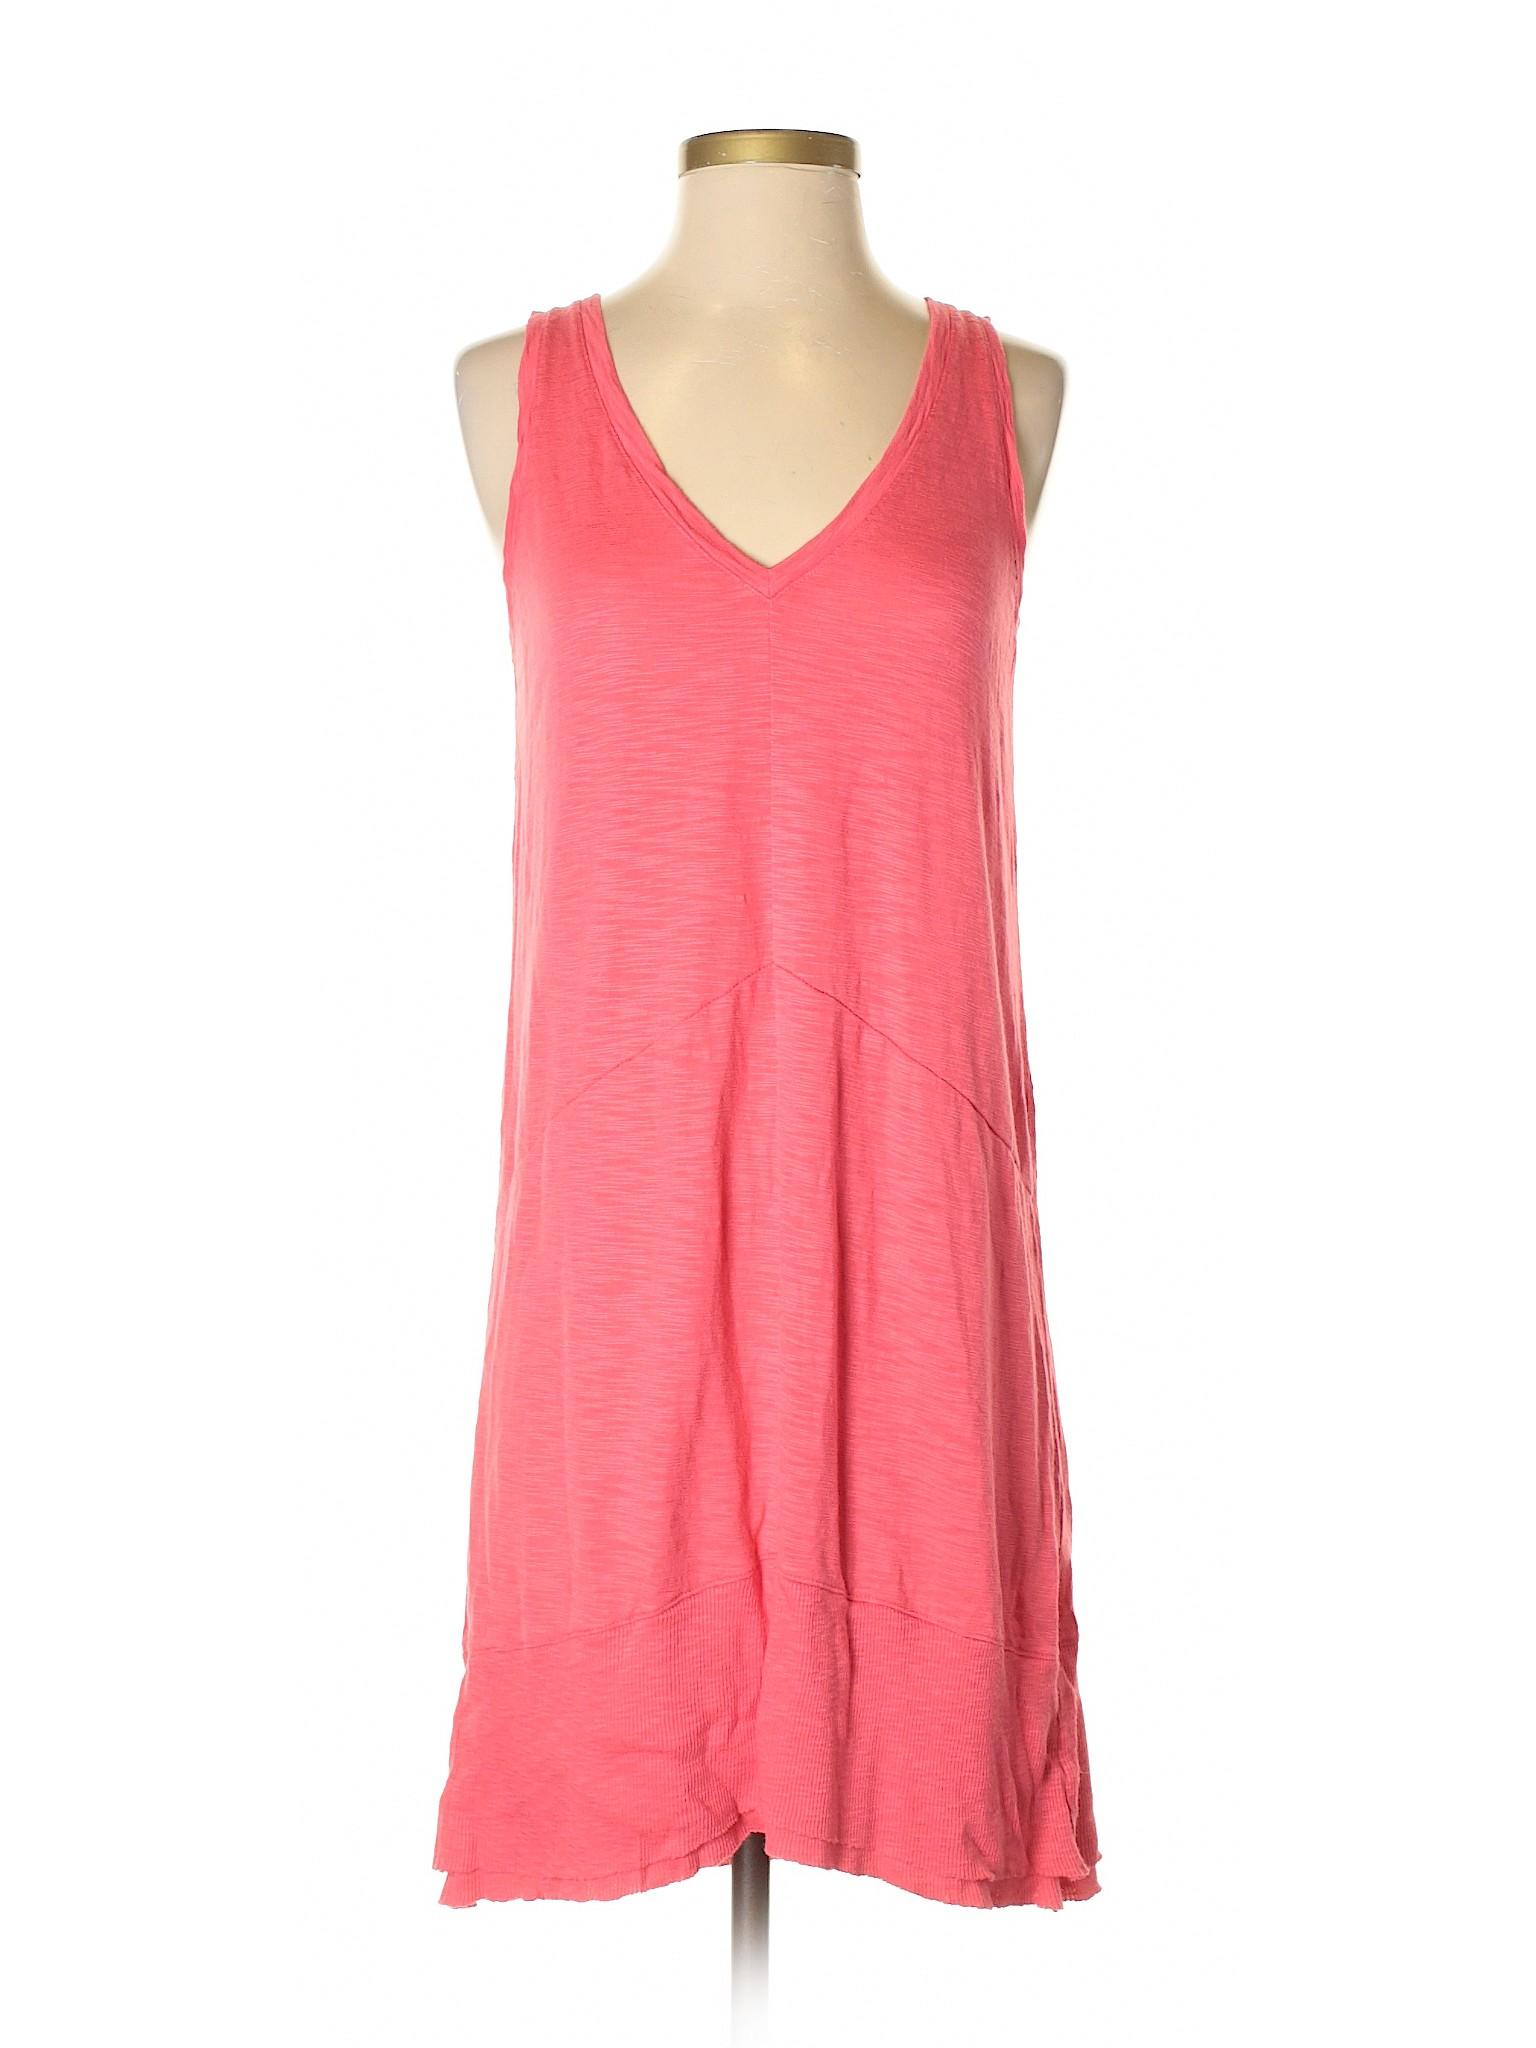 Selling Selling P Lilla Casual Lilla Lilla Casual P Selling Dress Dress r6qraAFw